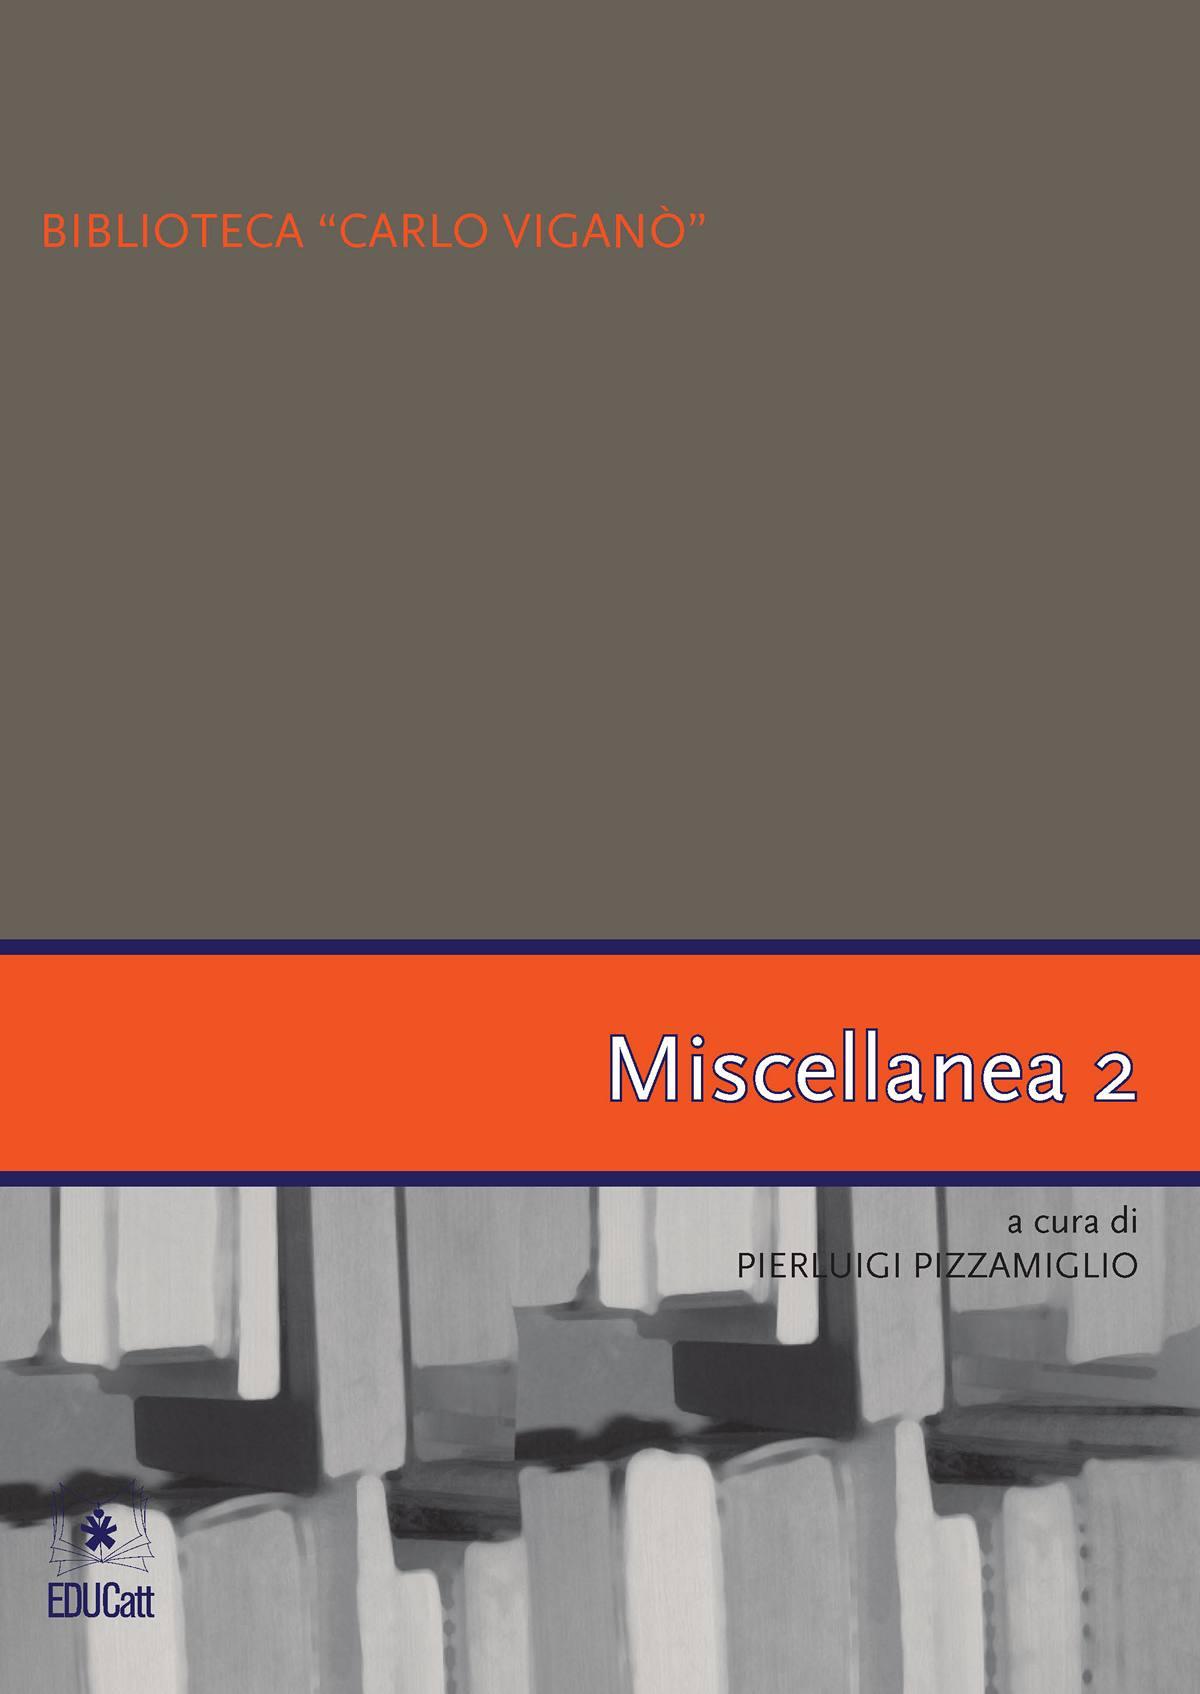 MISCELLANEA 2 - BIBLIOTECA CARLO VIGANO